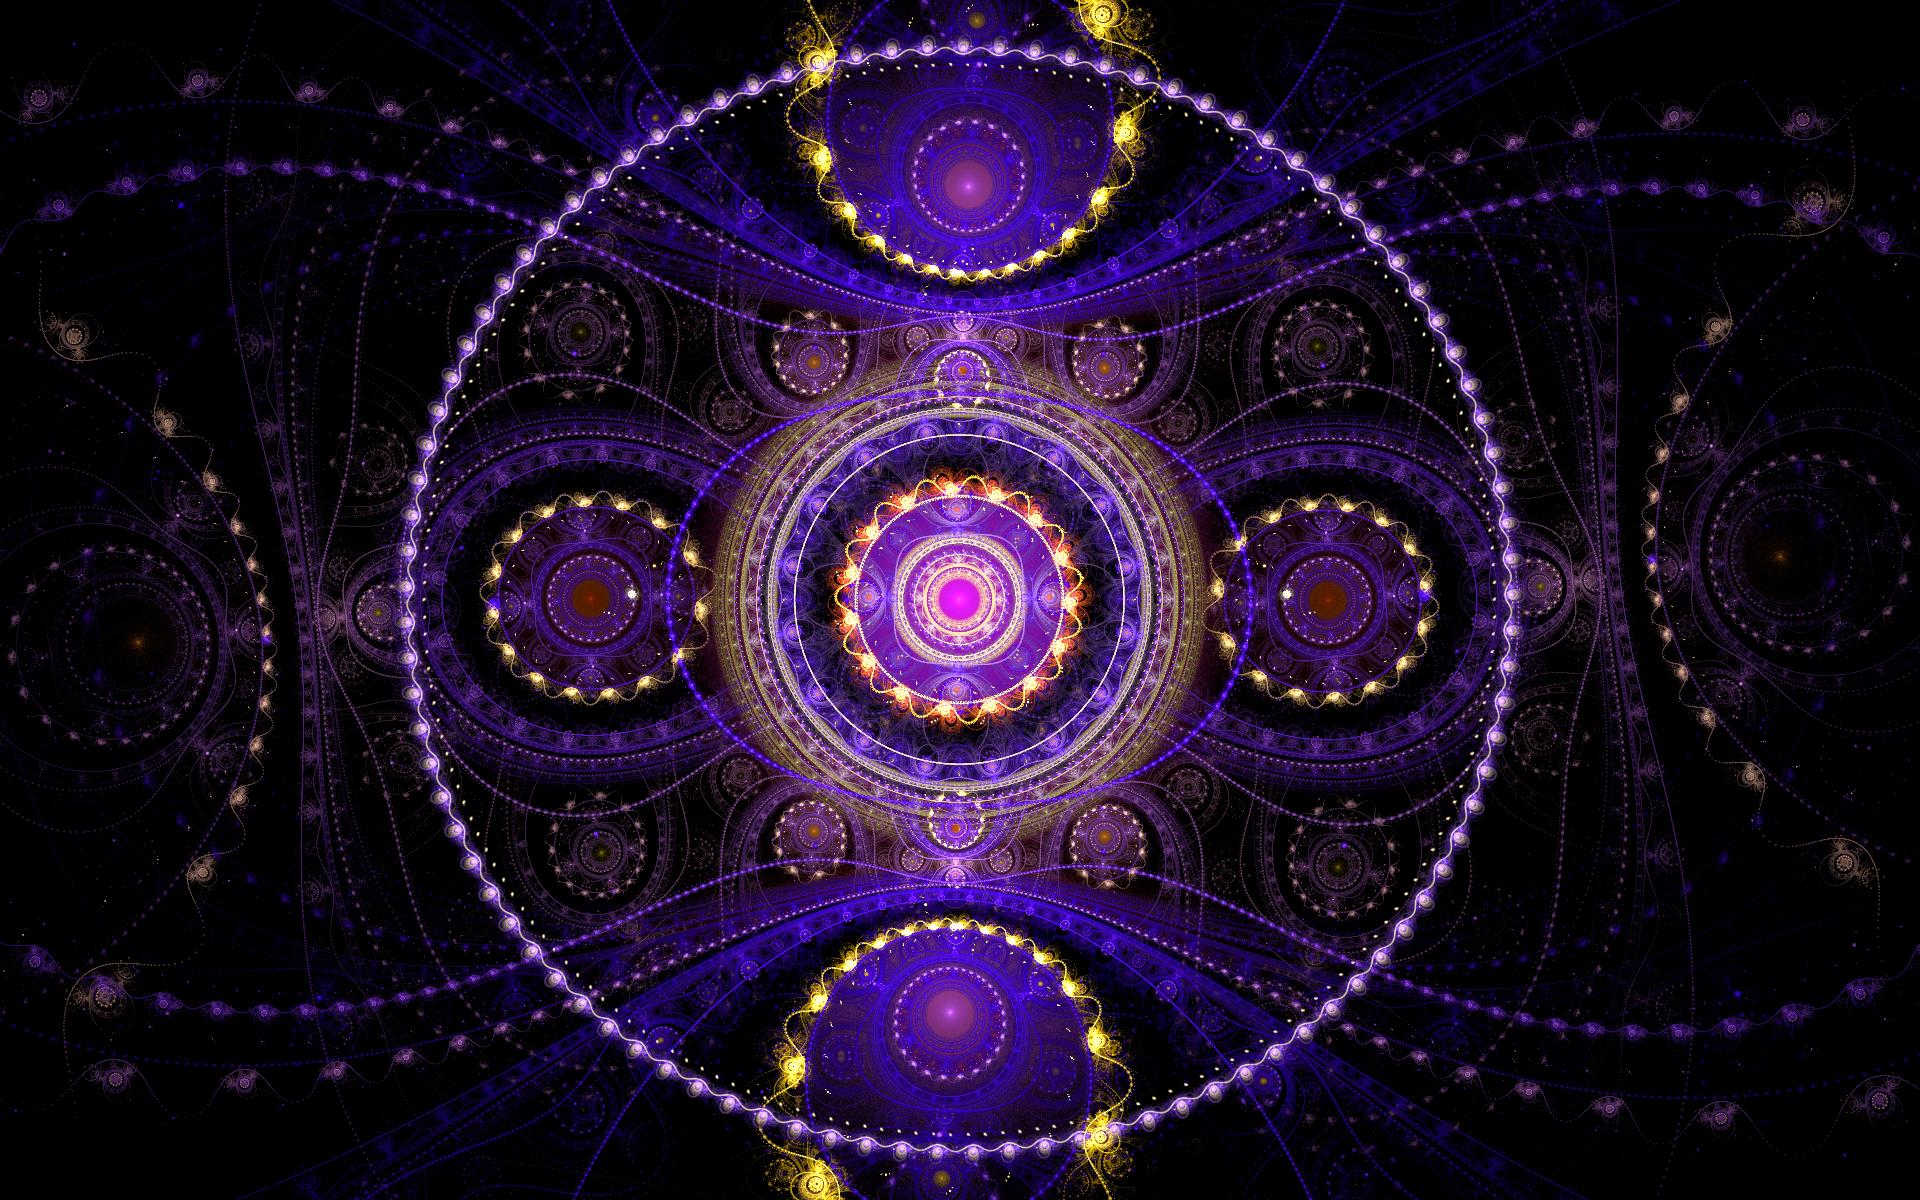 Rotary fractal pattern photo